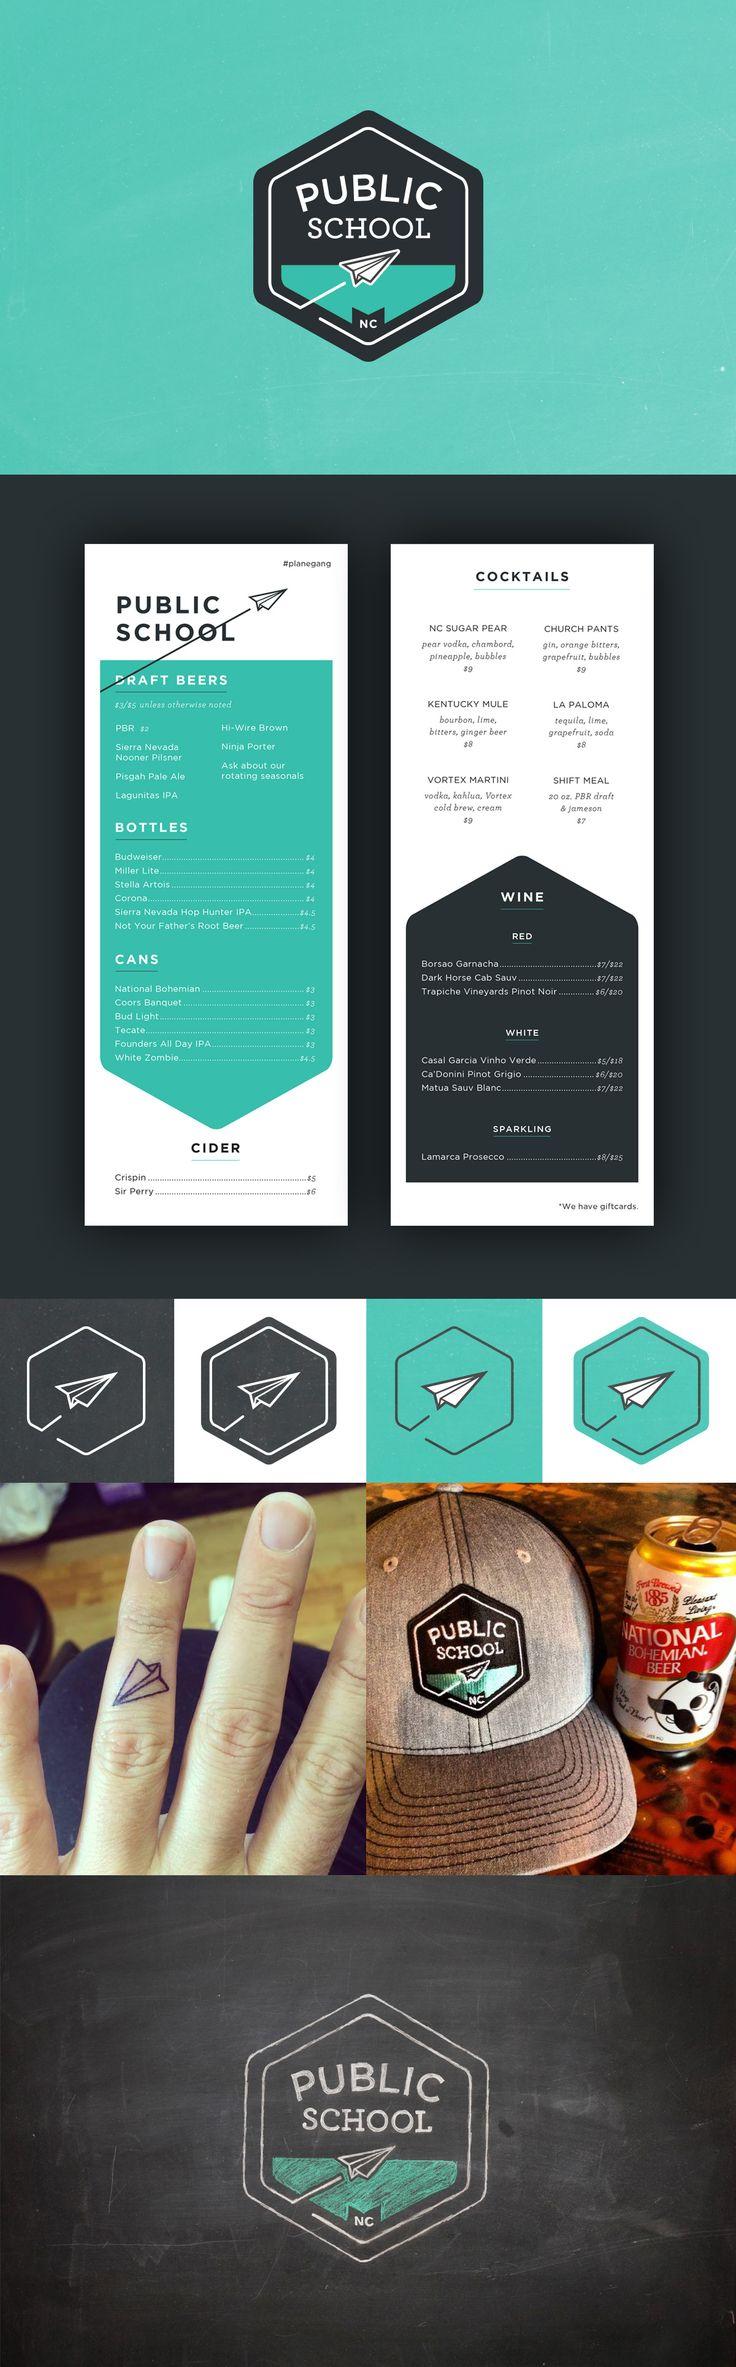 Public School Bar ~ Branding & Design by Snow in July Designs #logodesign #branding